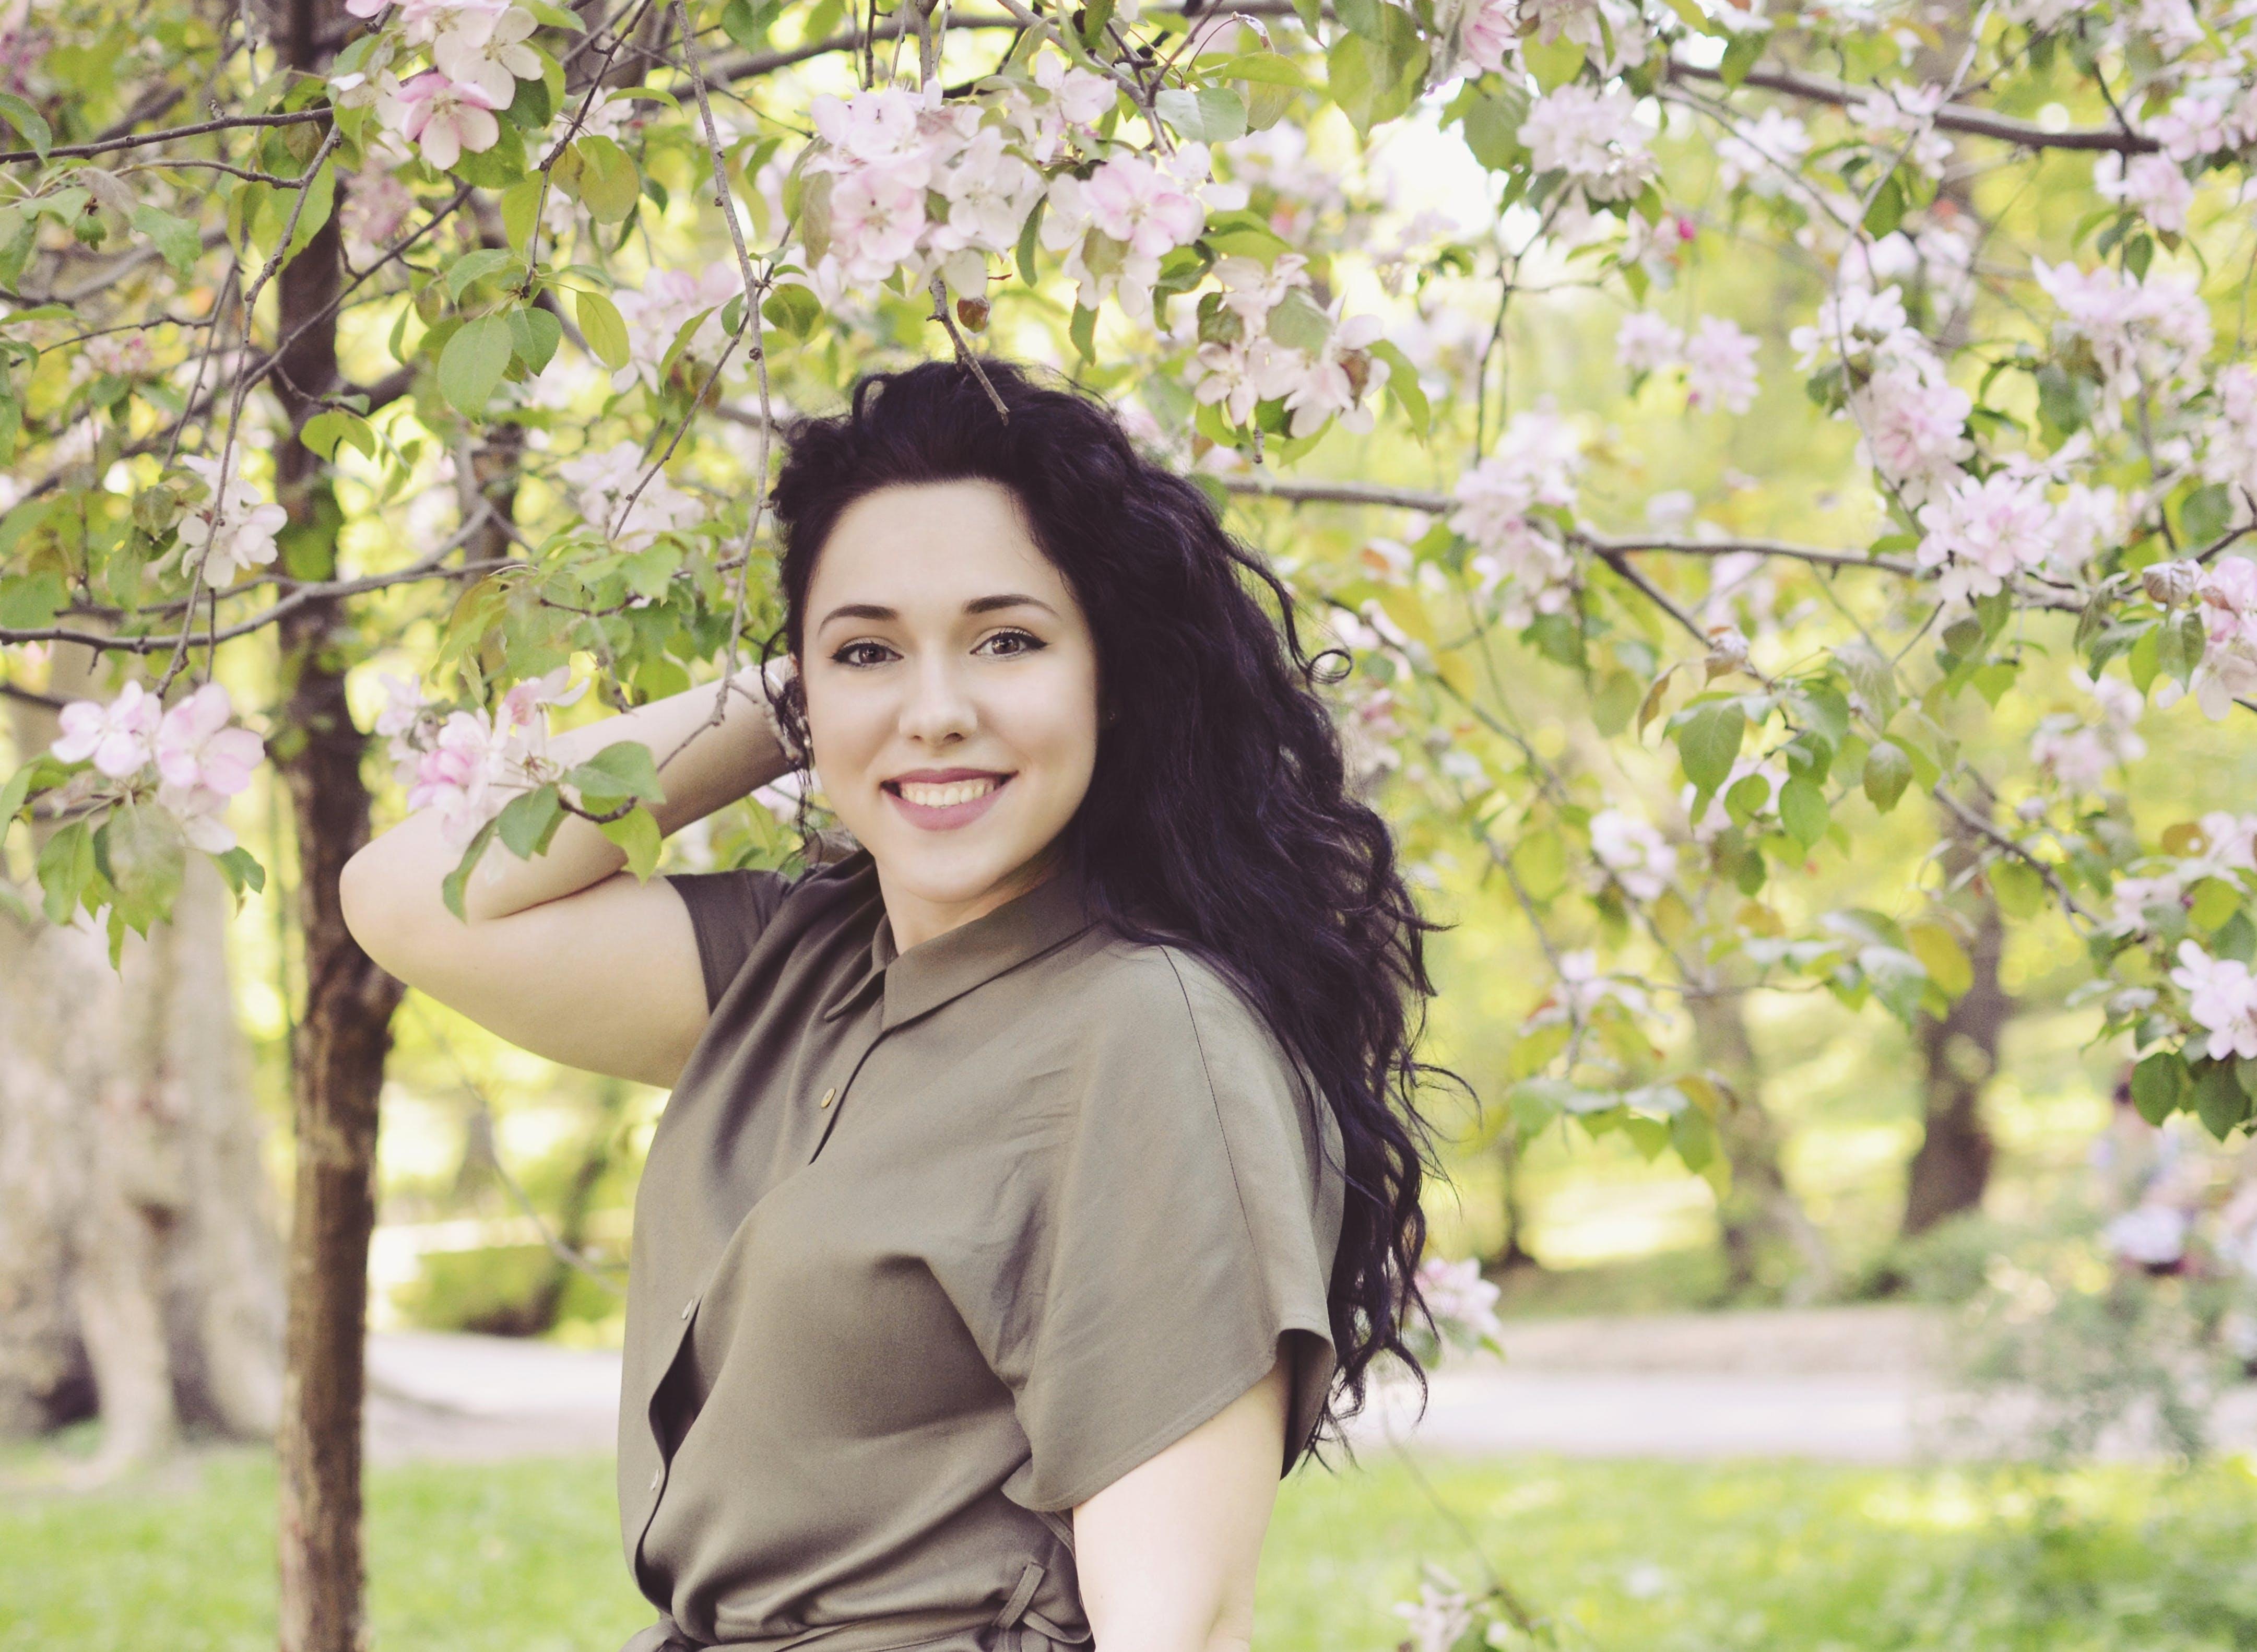 Woman Holding Her Hair Near Flowering Tree